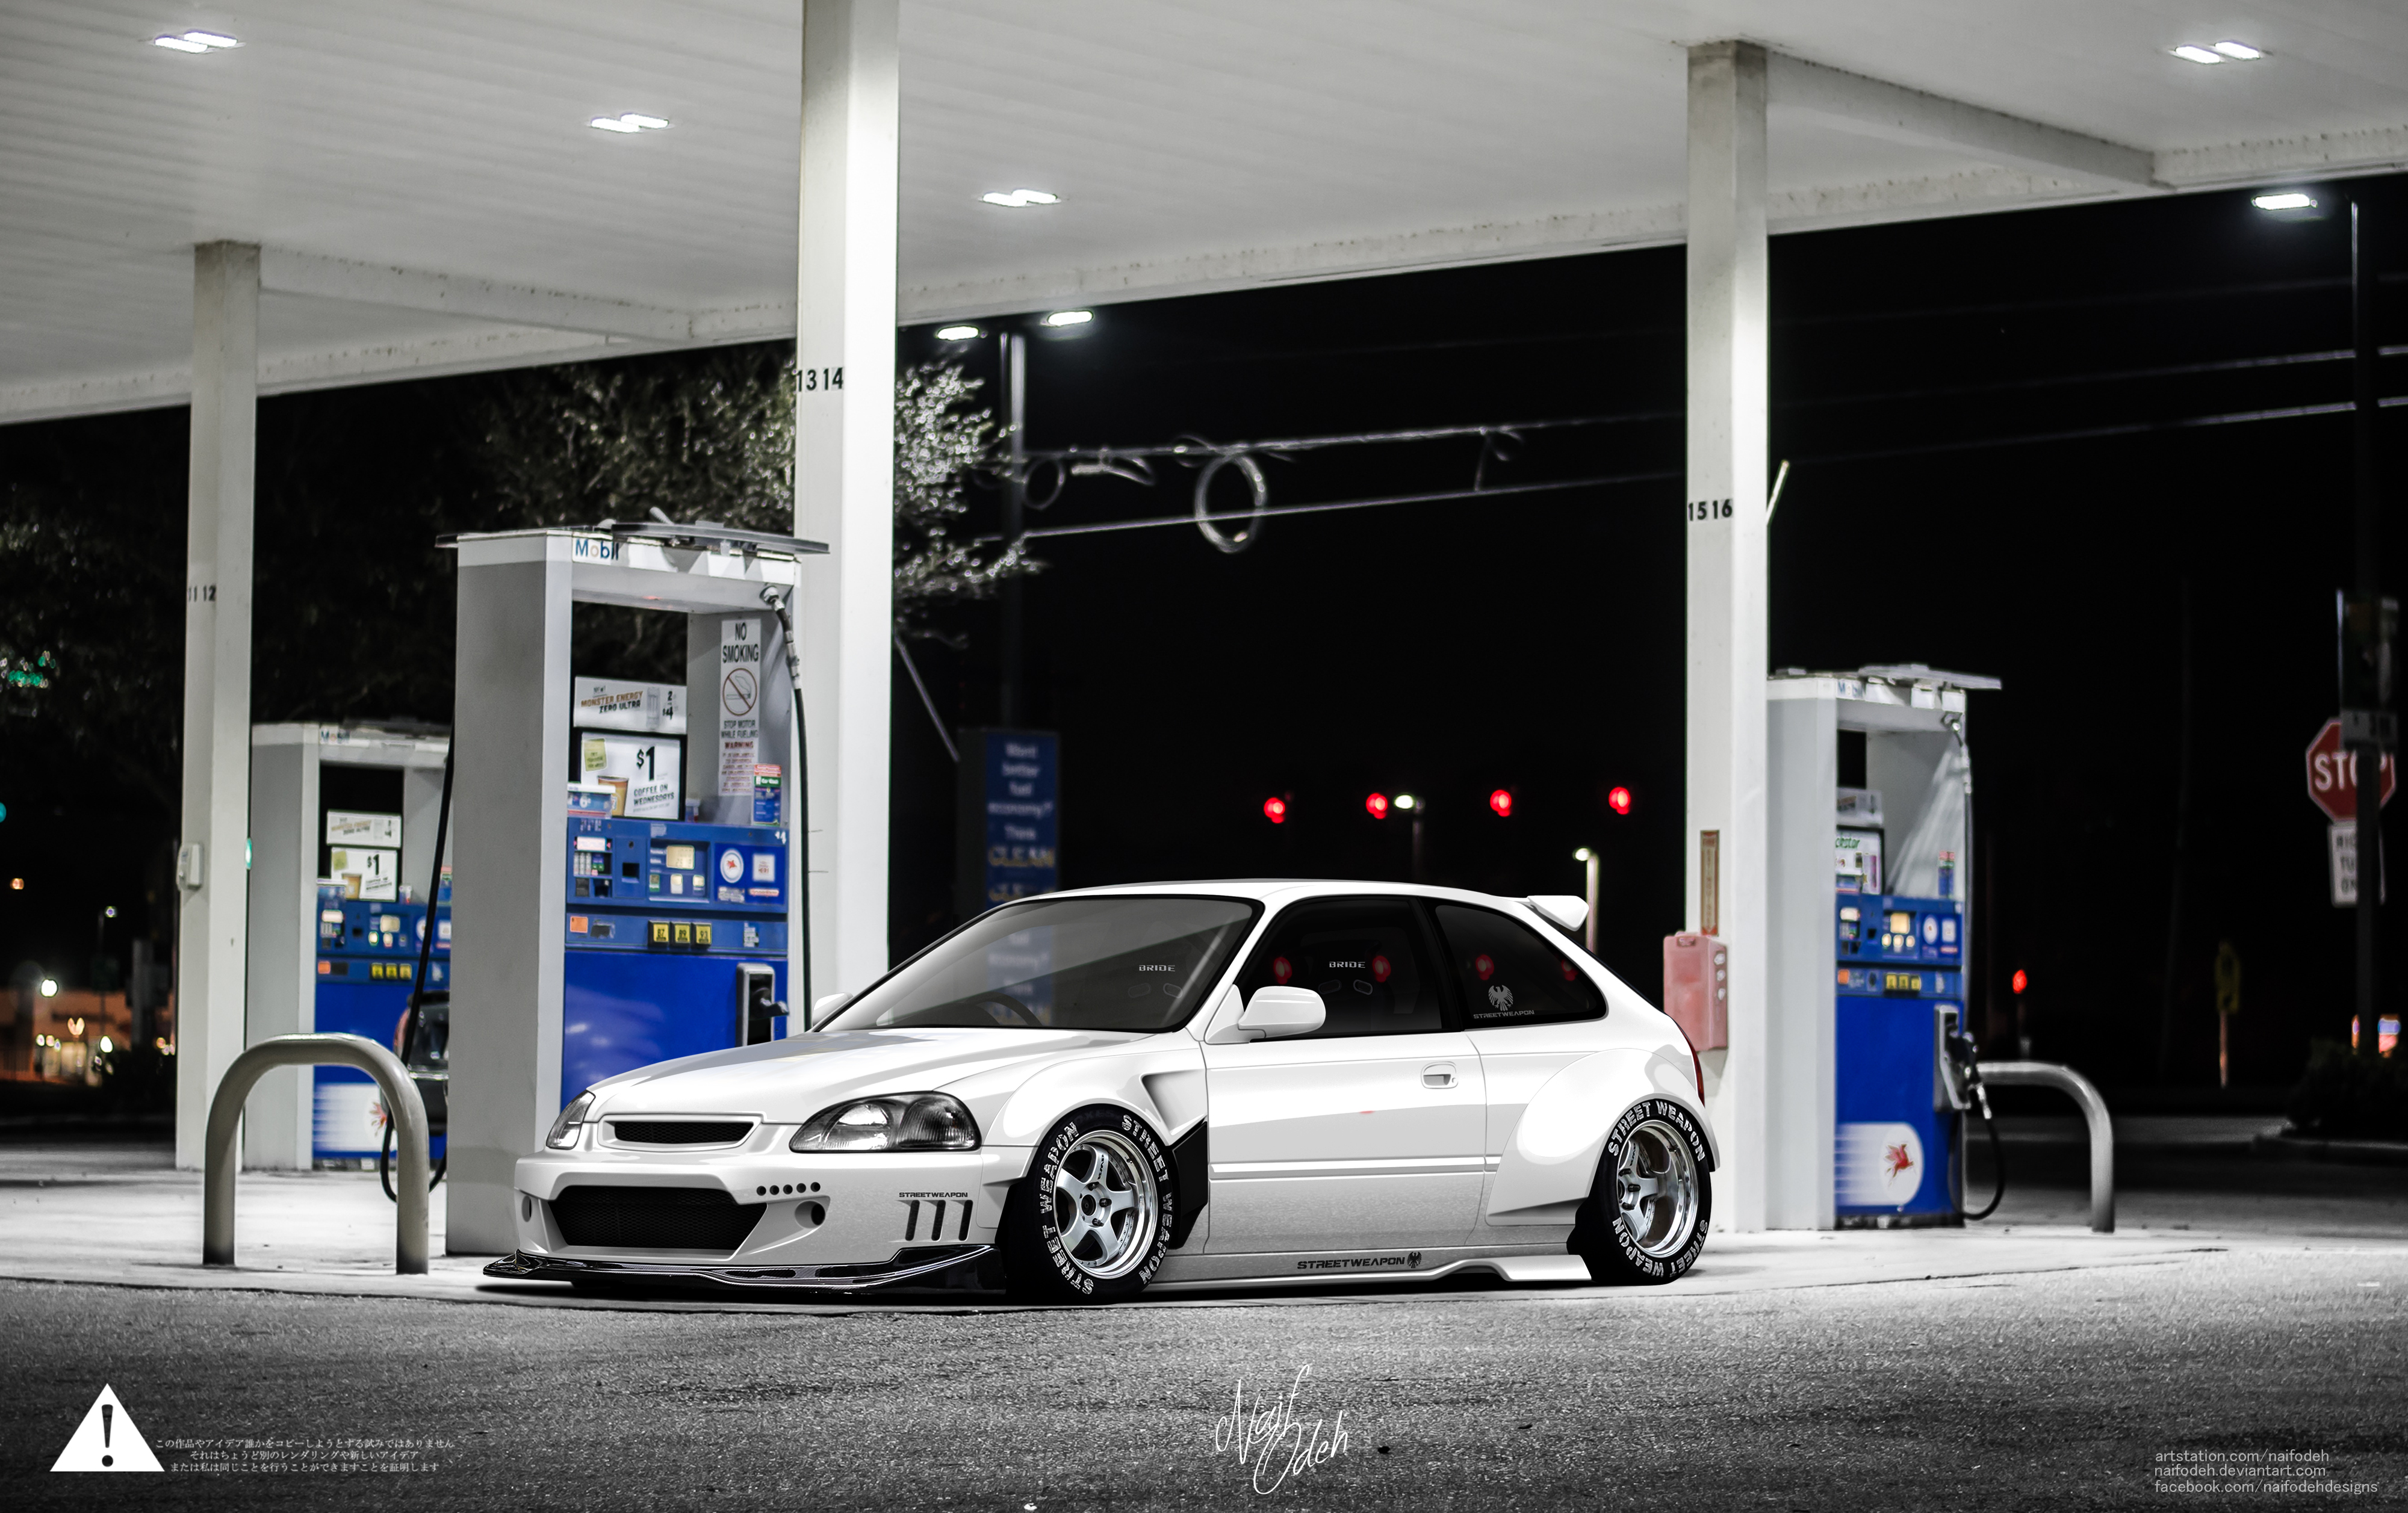 Honda Civic Ek Stance Rocket Bunny by naifodeh on DeviantArt